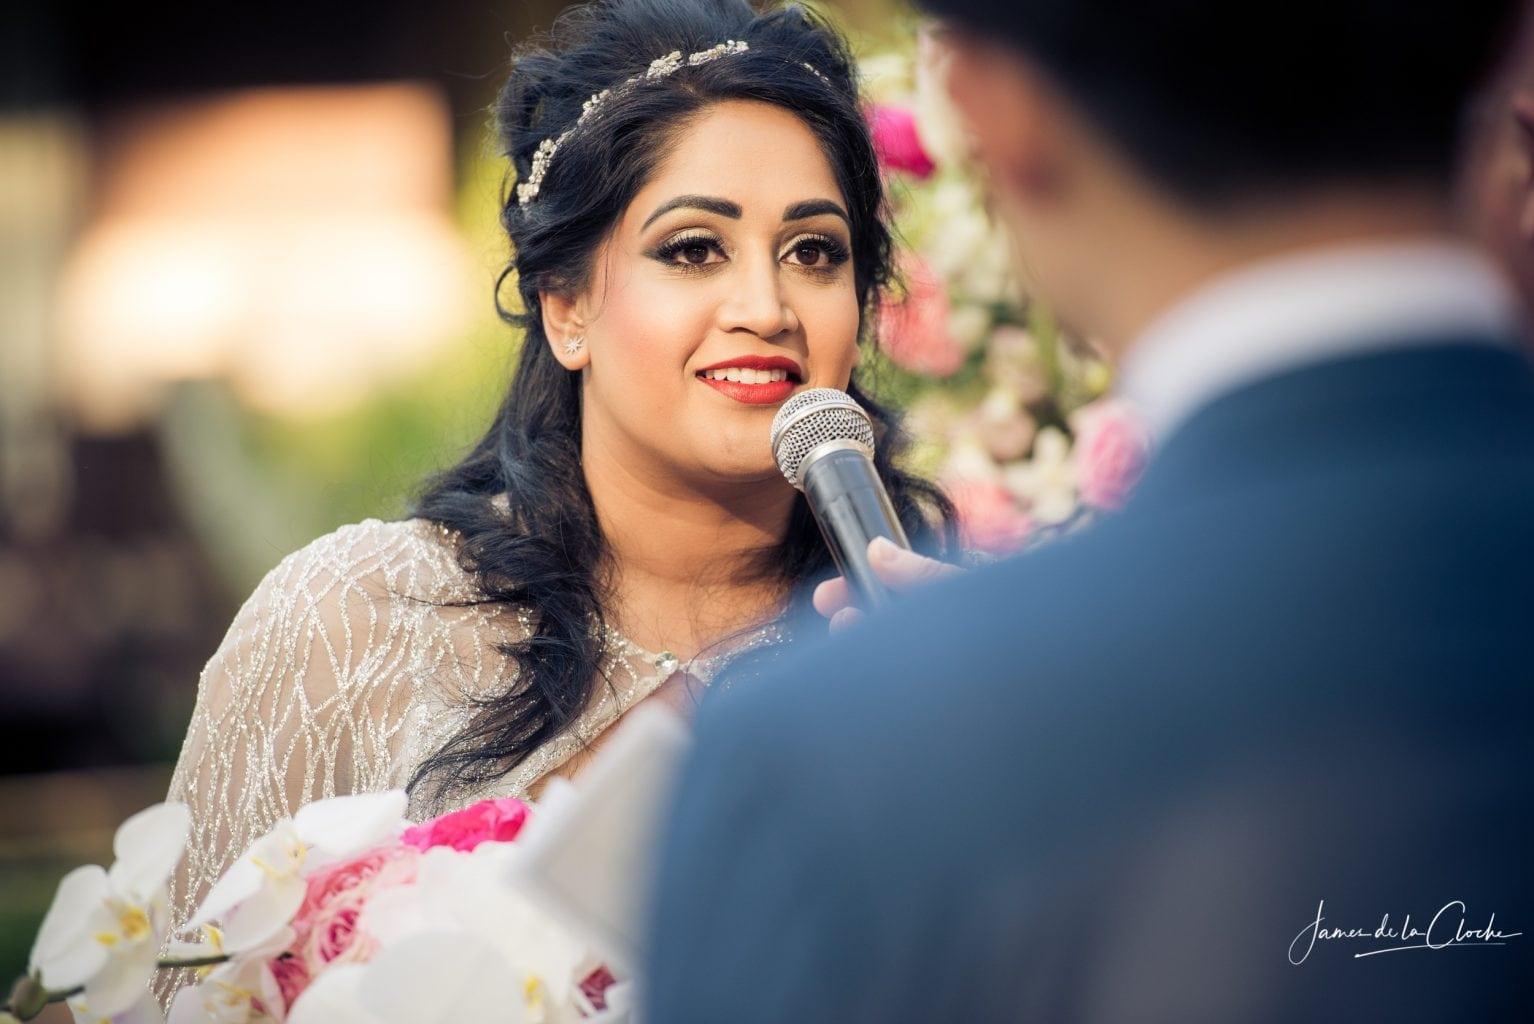 The Bride Speaks Her Vows